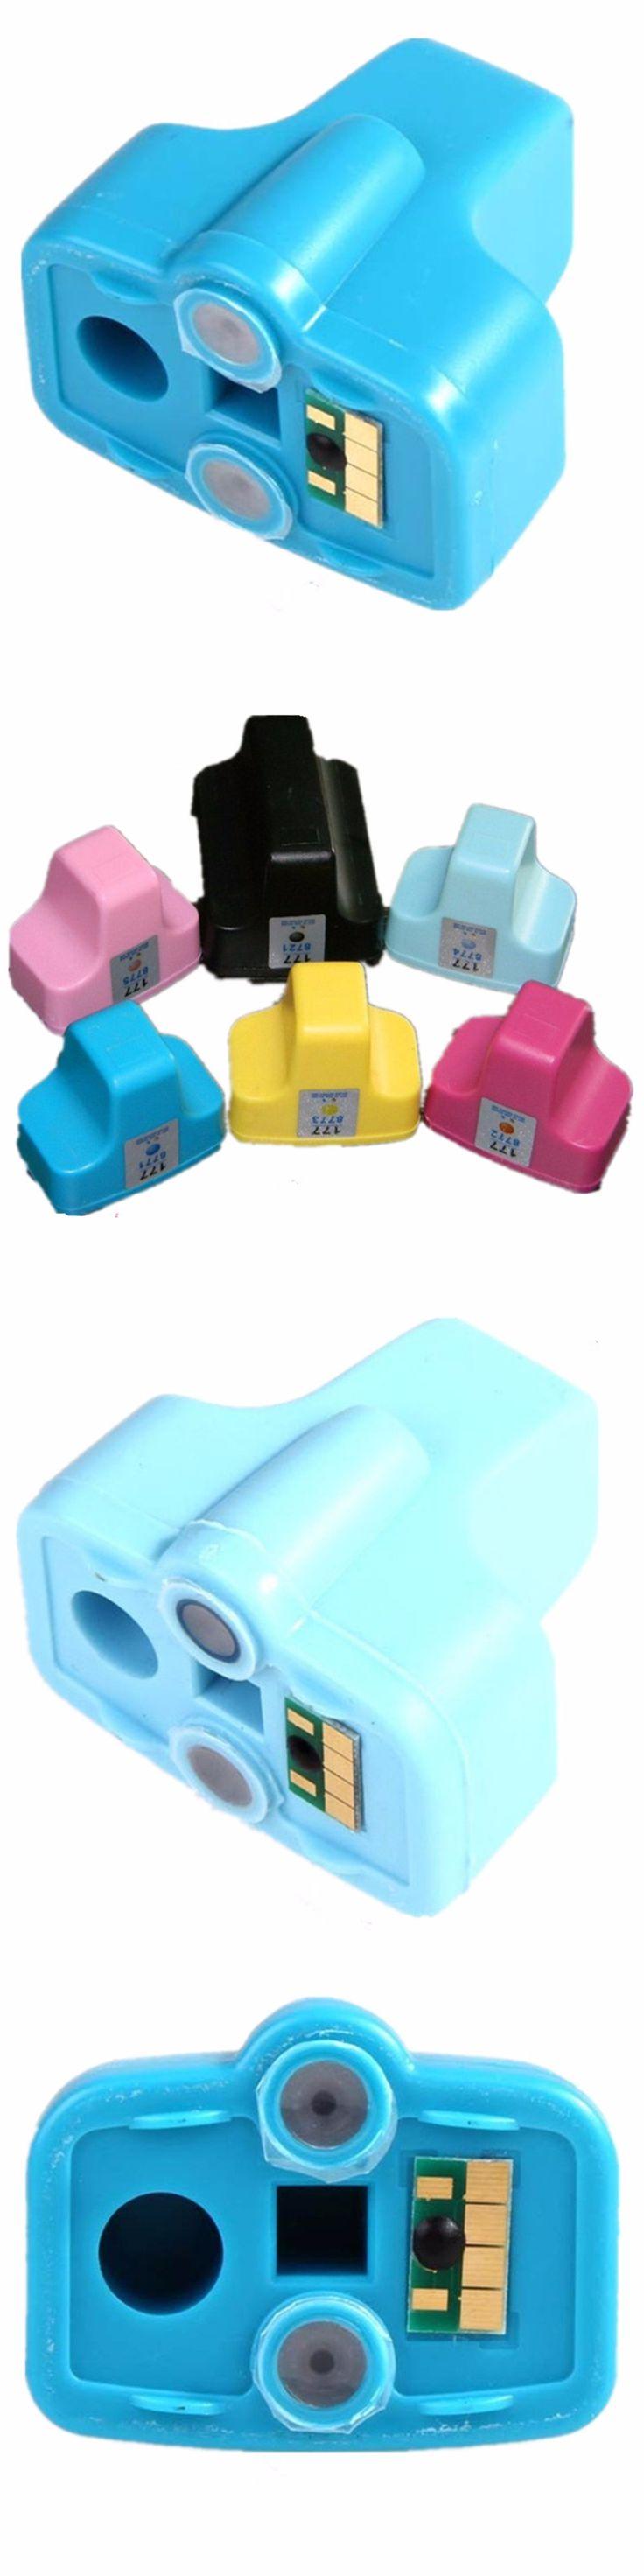 6 Pcs Ink Cartridges For HP 177 XL HP177 HP177XL 177XL Smart C5183 C5185 C5188 C5190